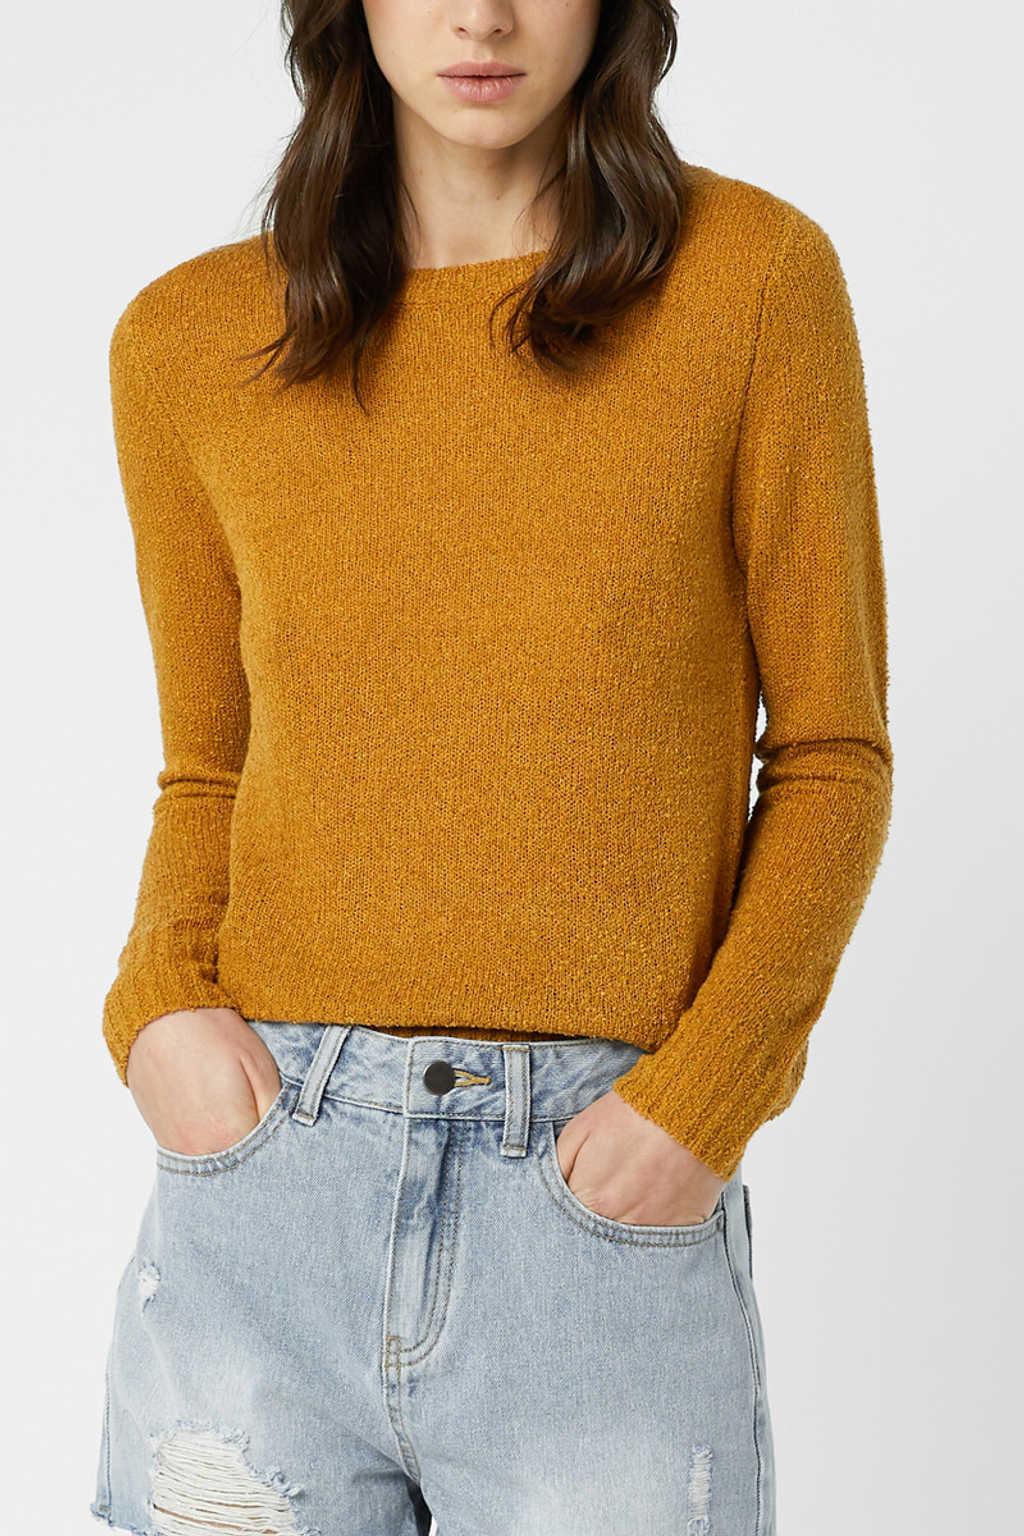 Sweater 3376 Mustard 1